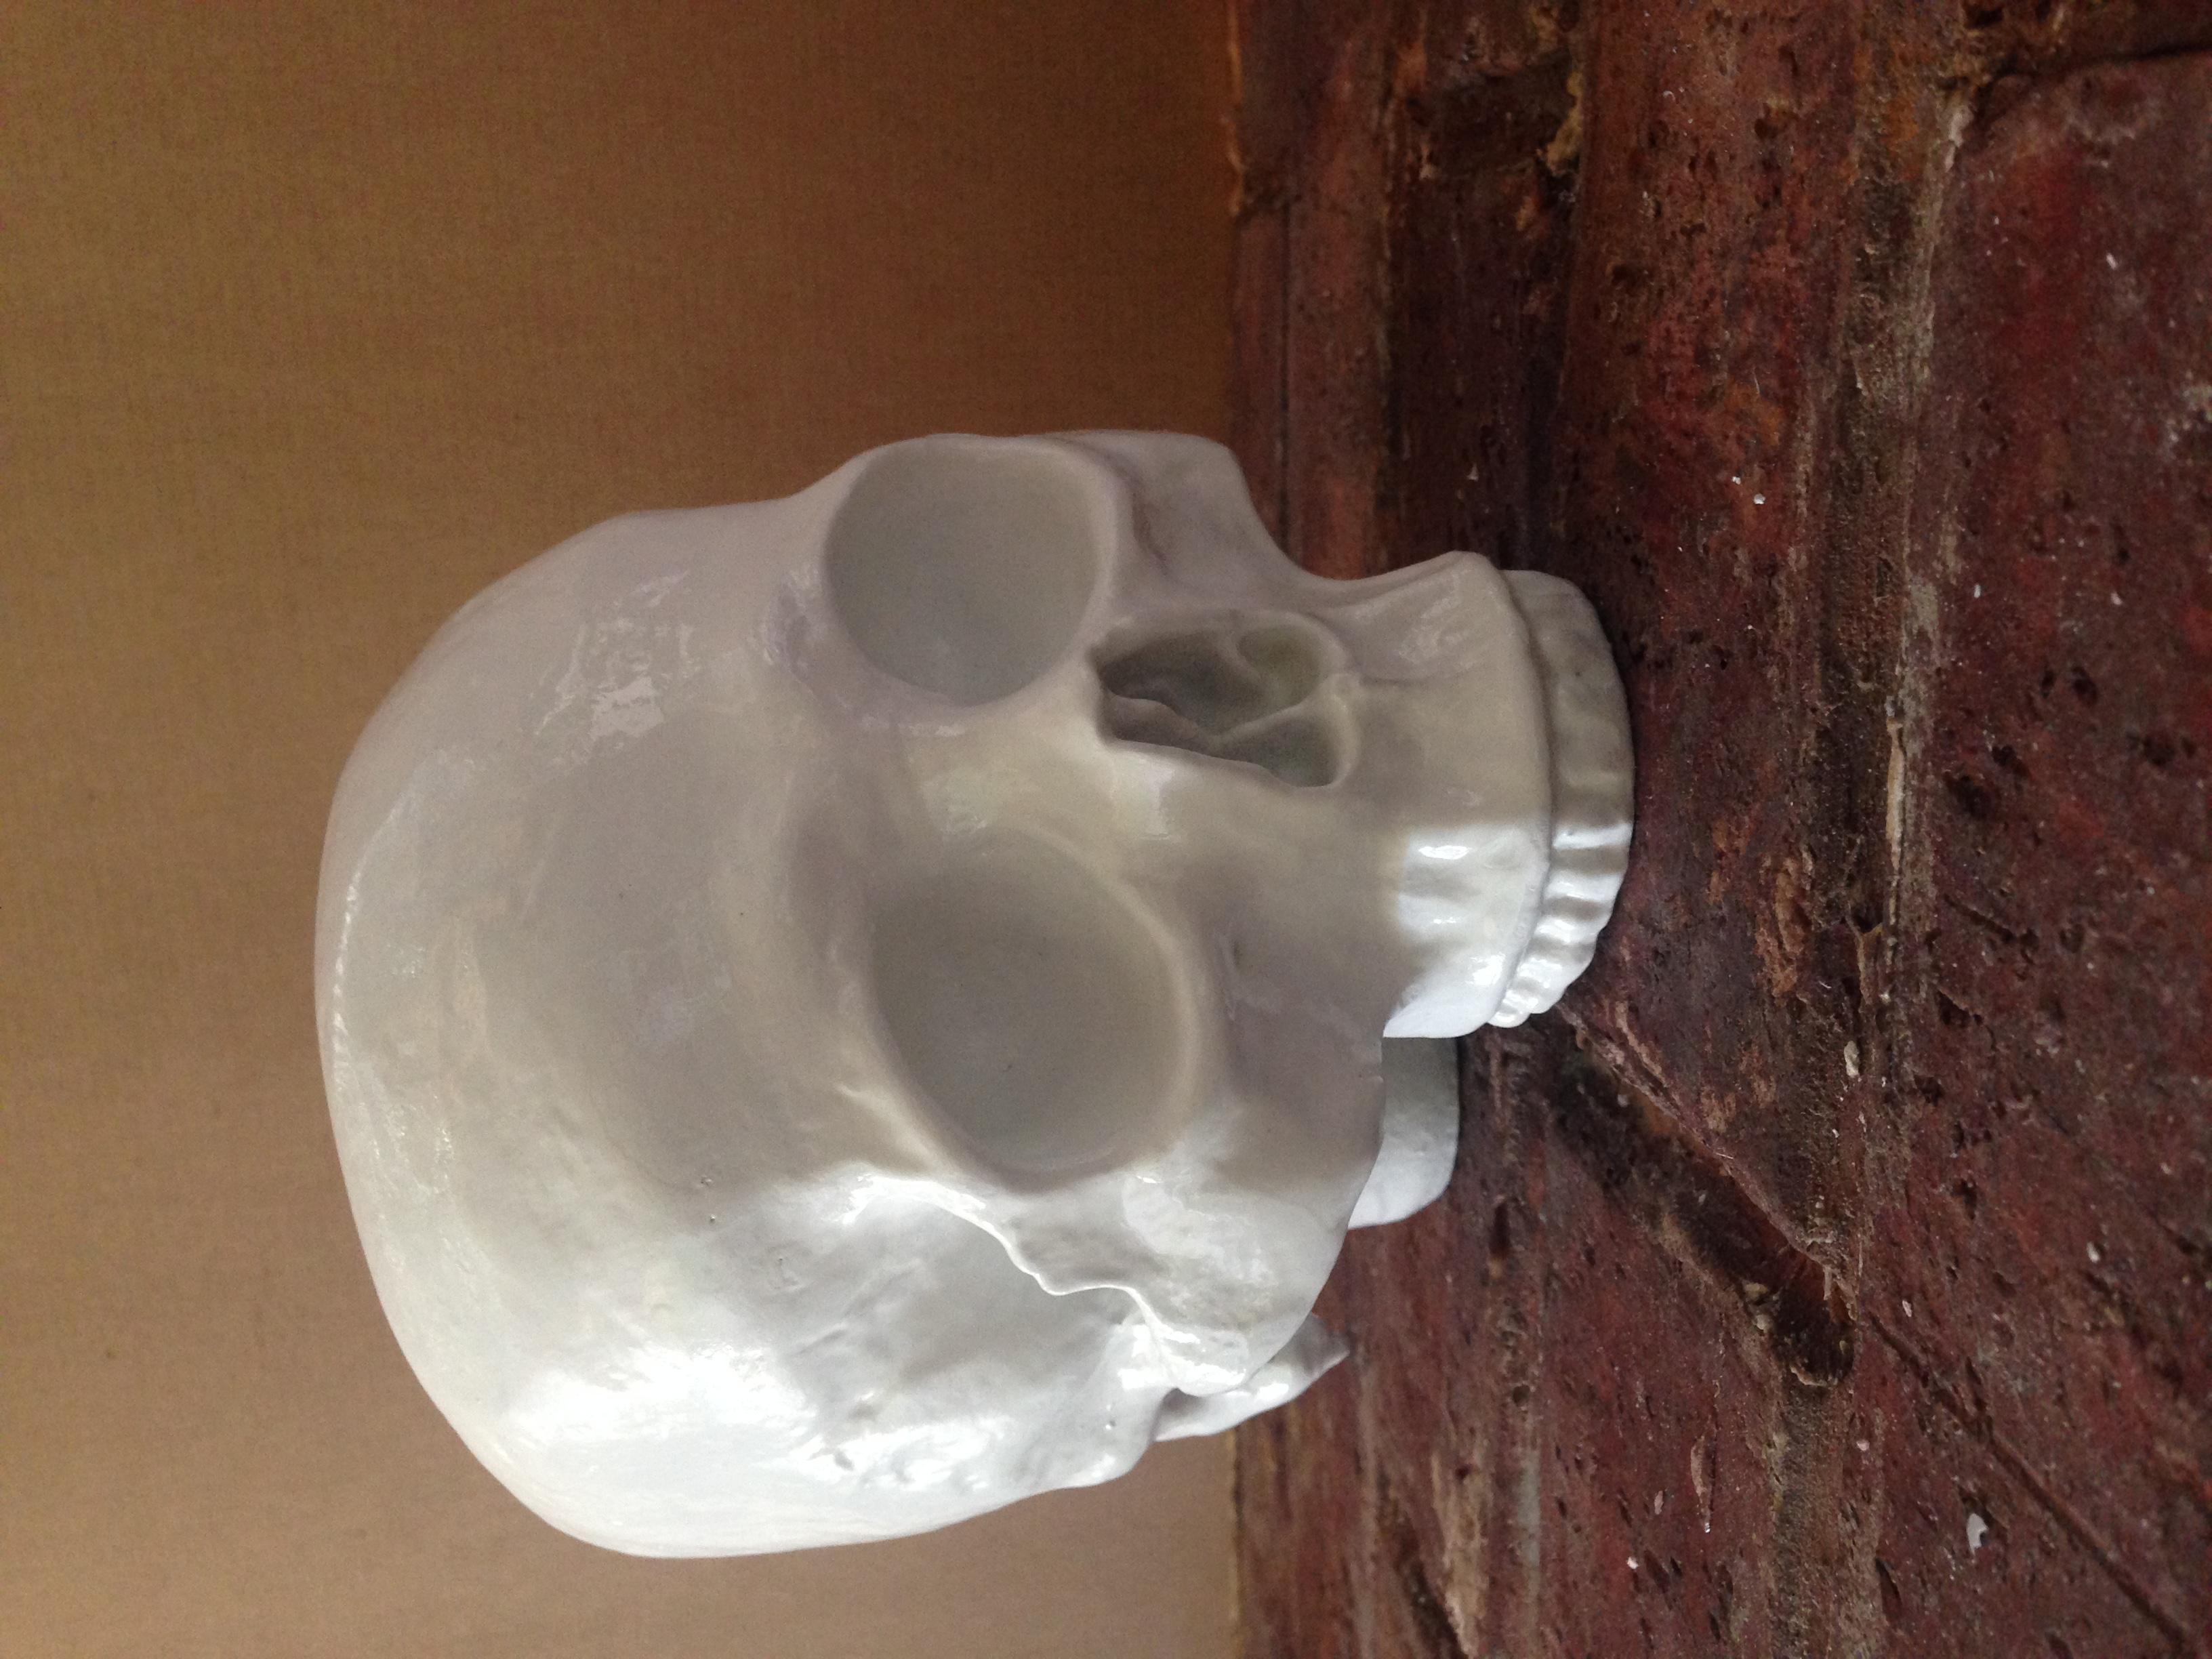 fabricated skull